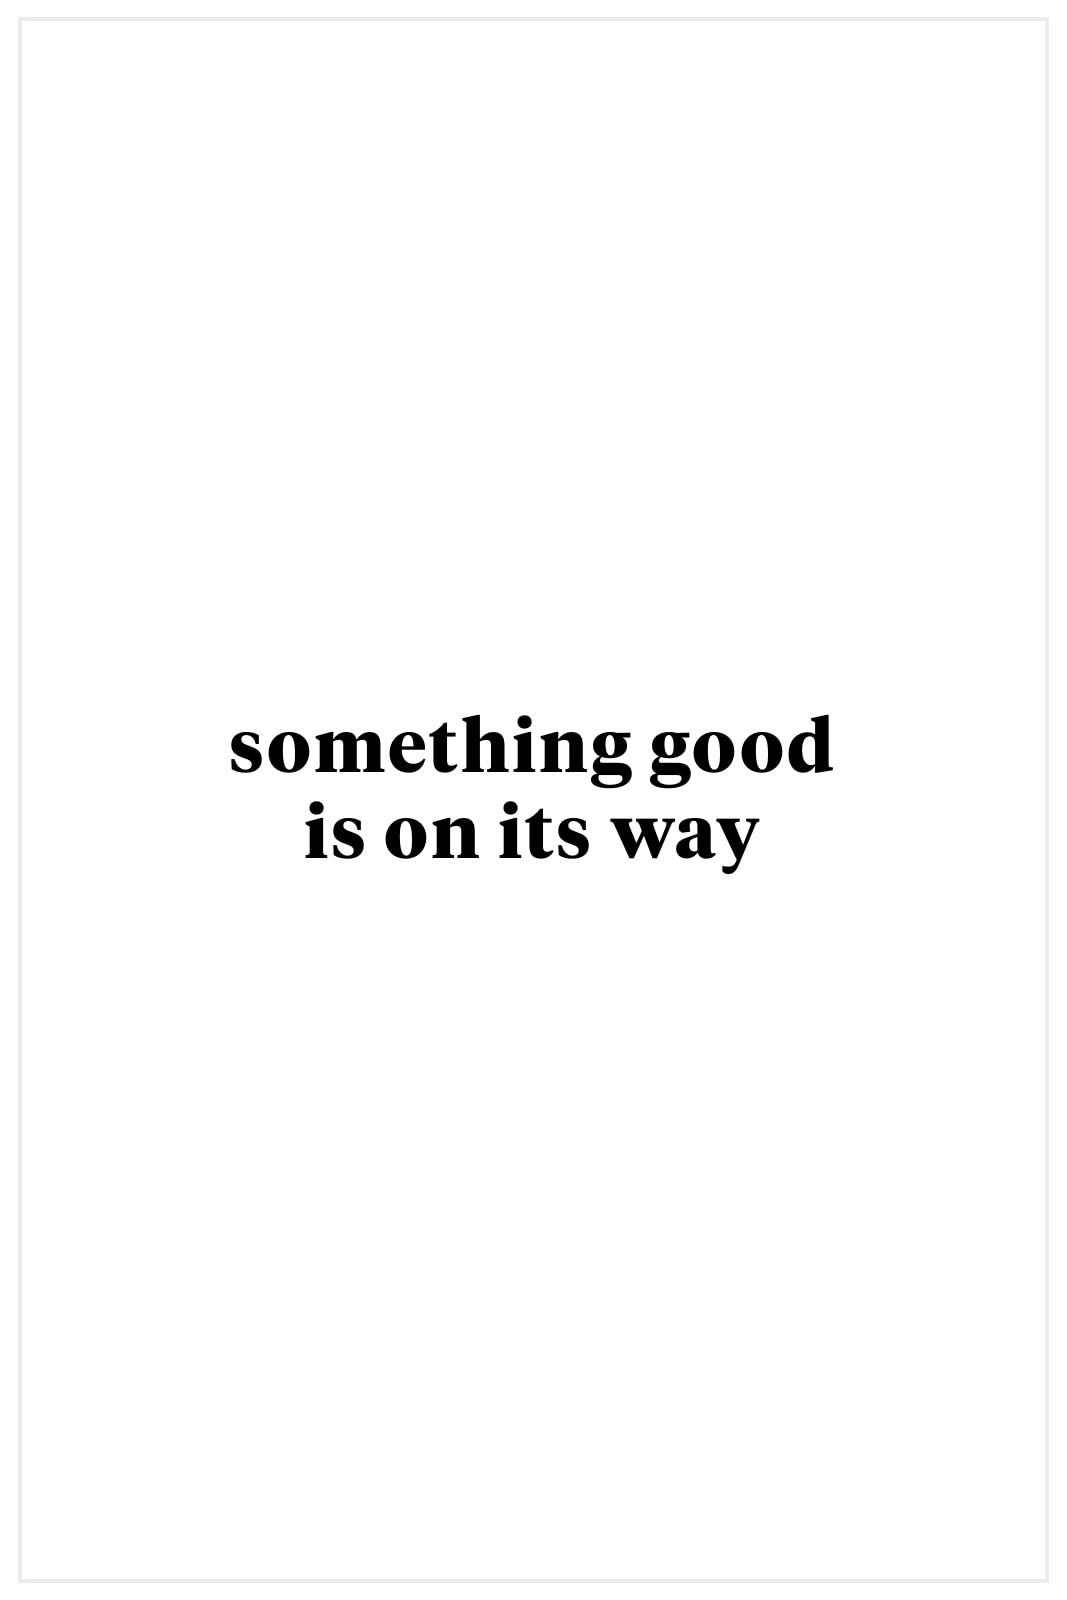 Gola Orchid II Cheetah Sneaker